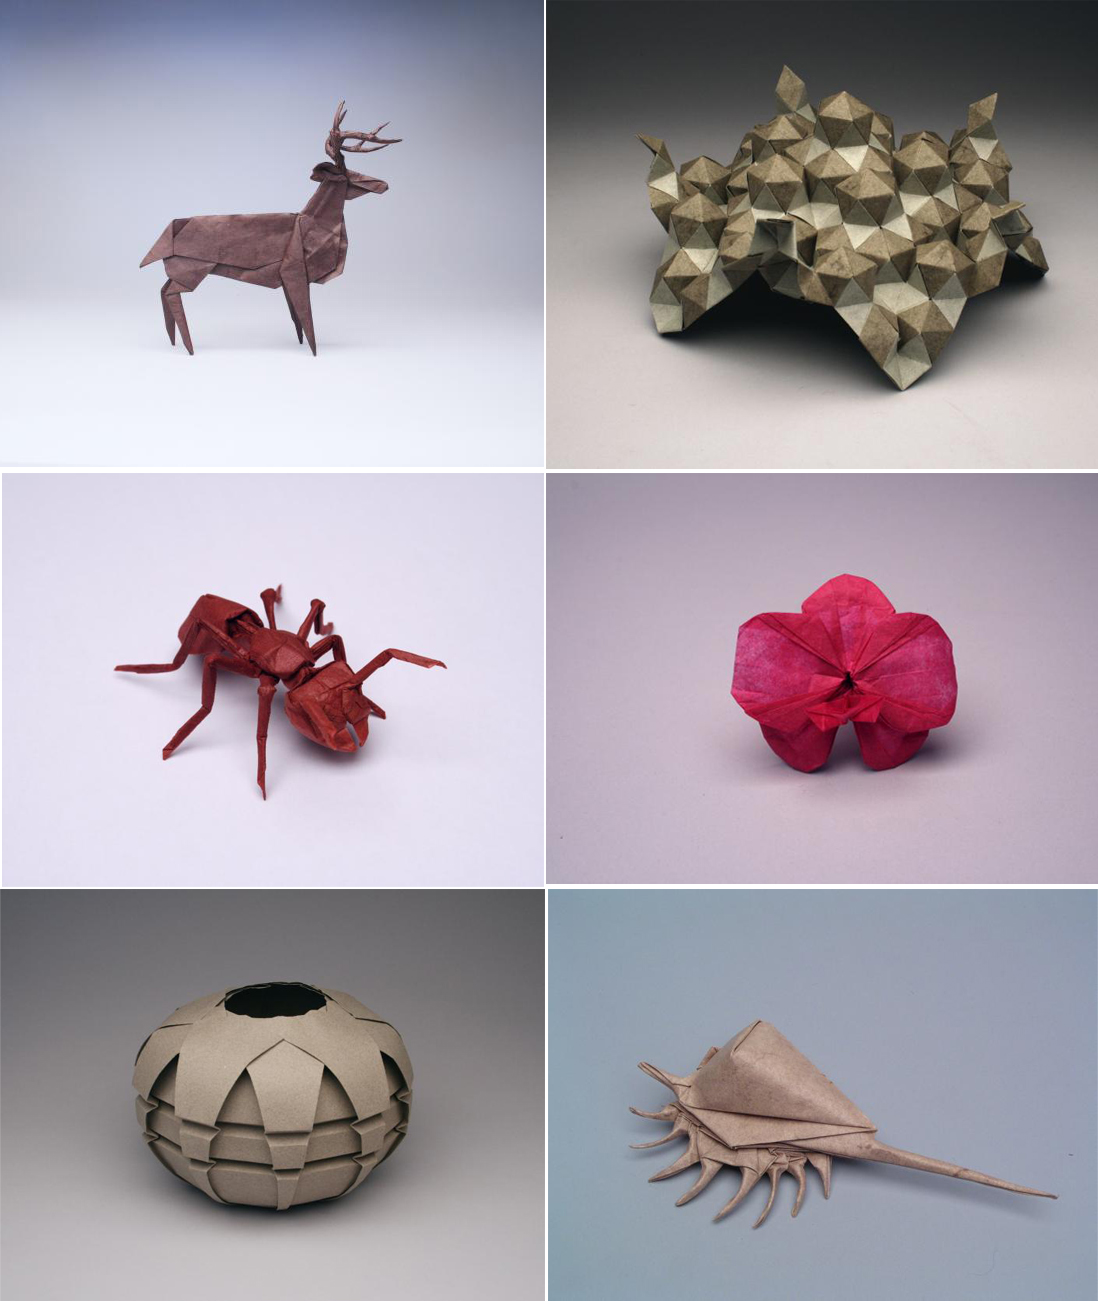 Creaciones de Robert J. Lang - Imágenes: www.langorigami.com